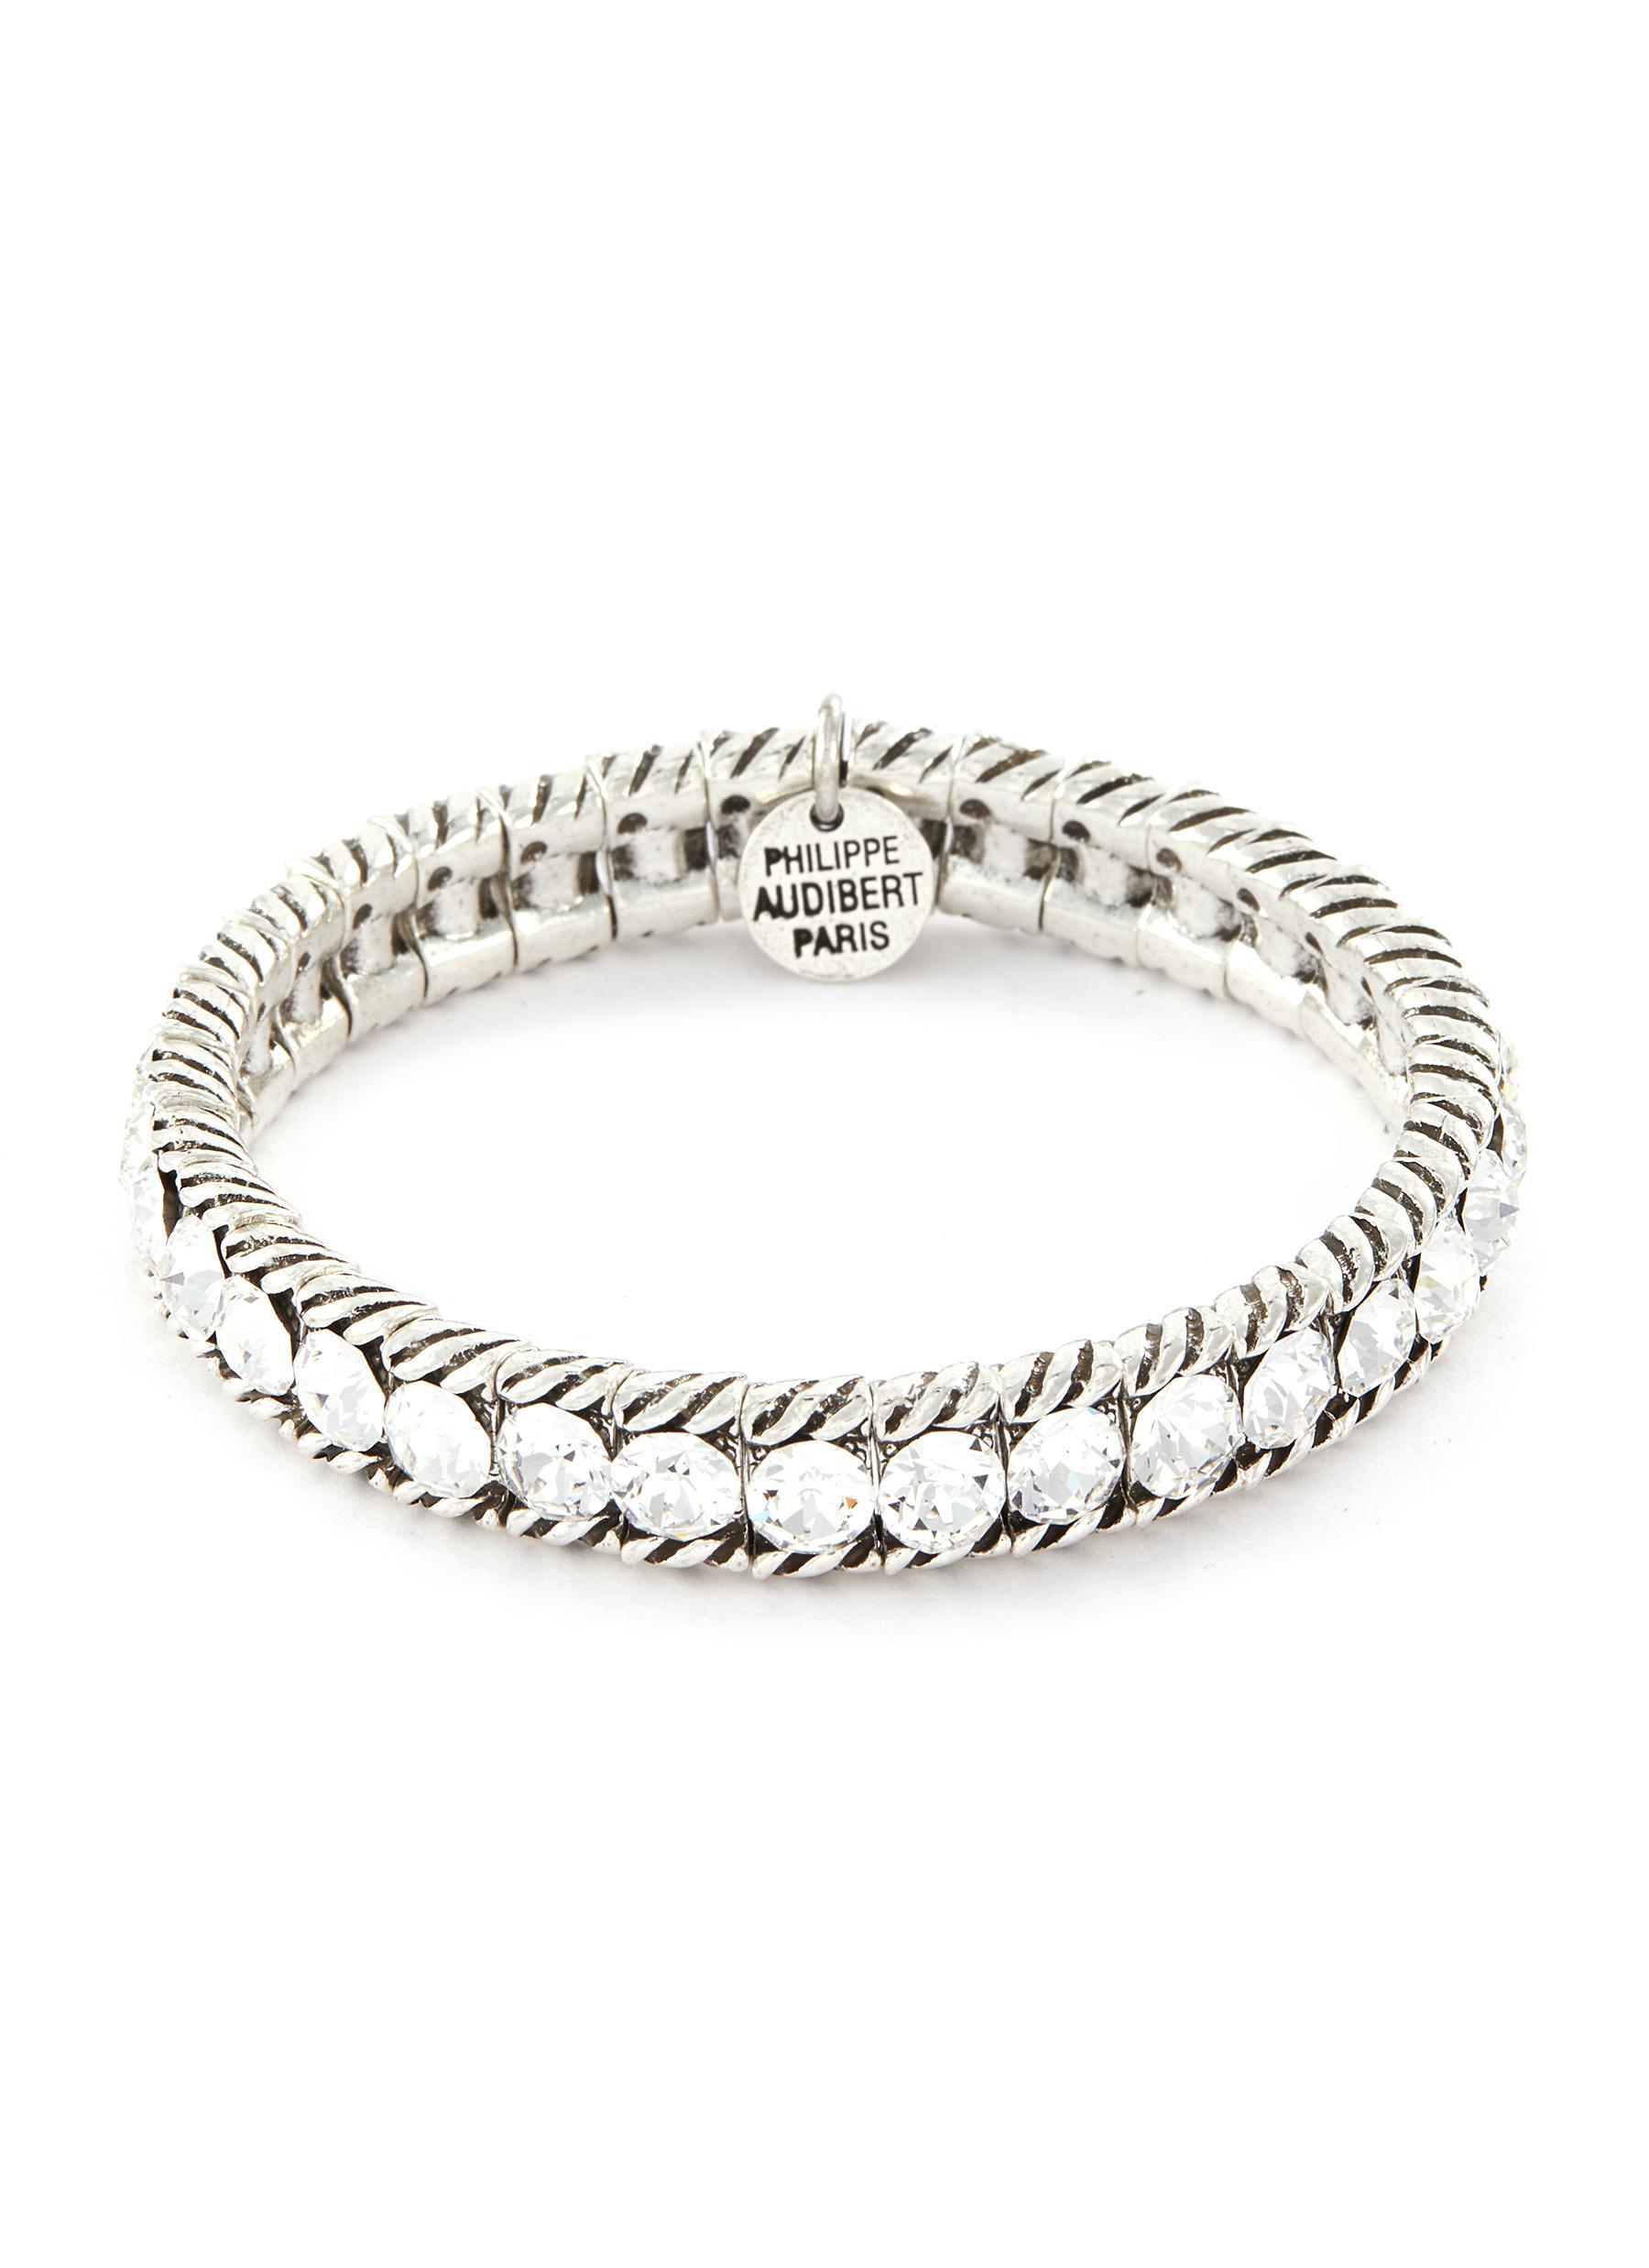 Philippe Audibert Silk 'anita' Swarovski Crystal Bracelet